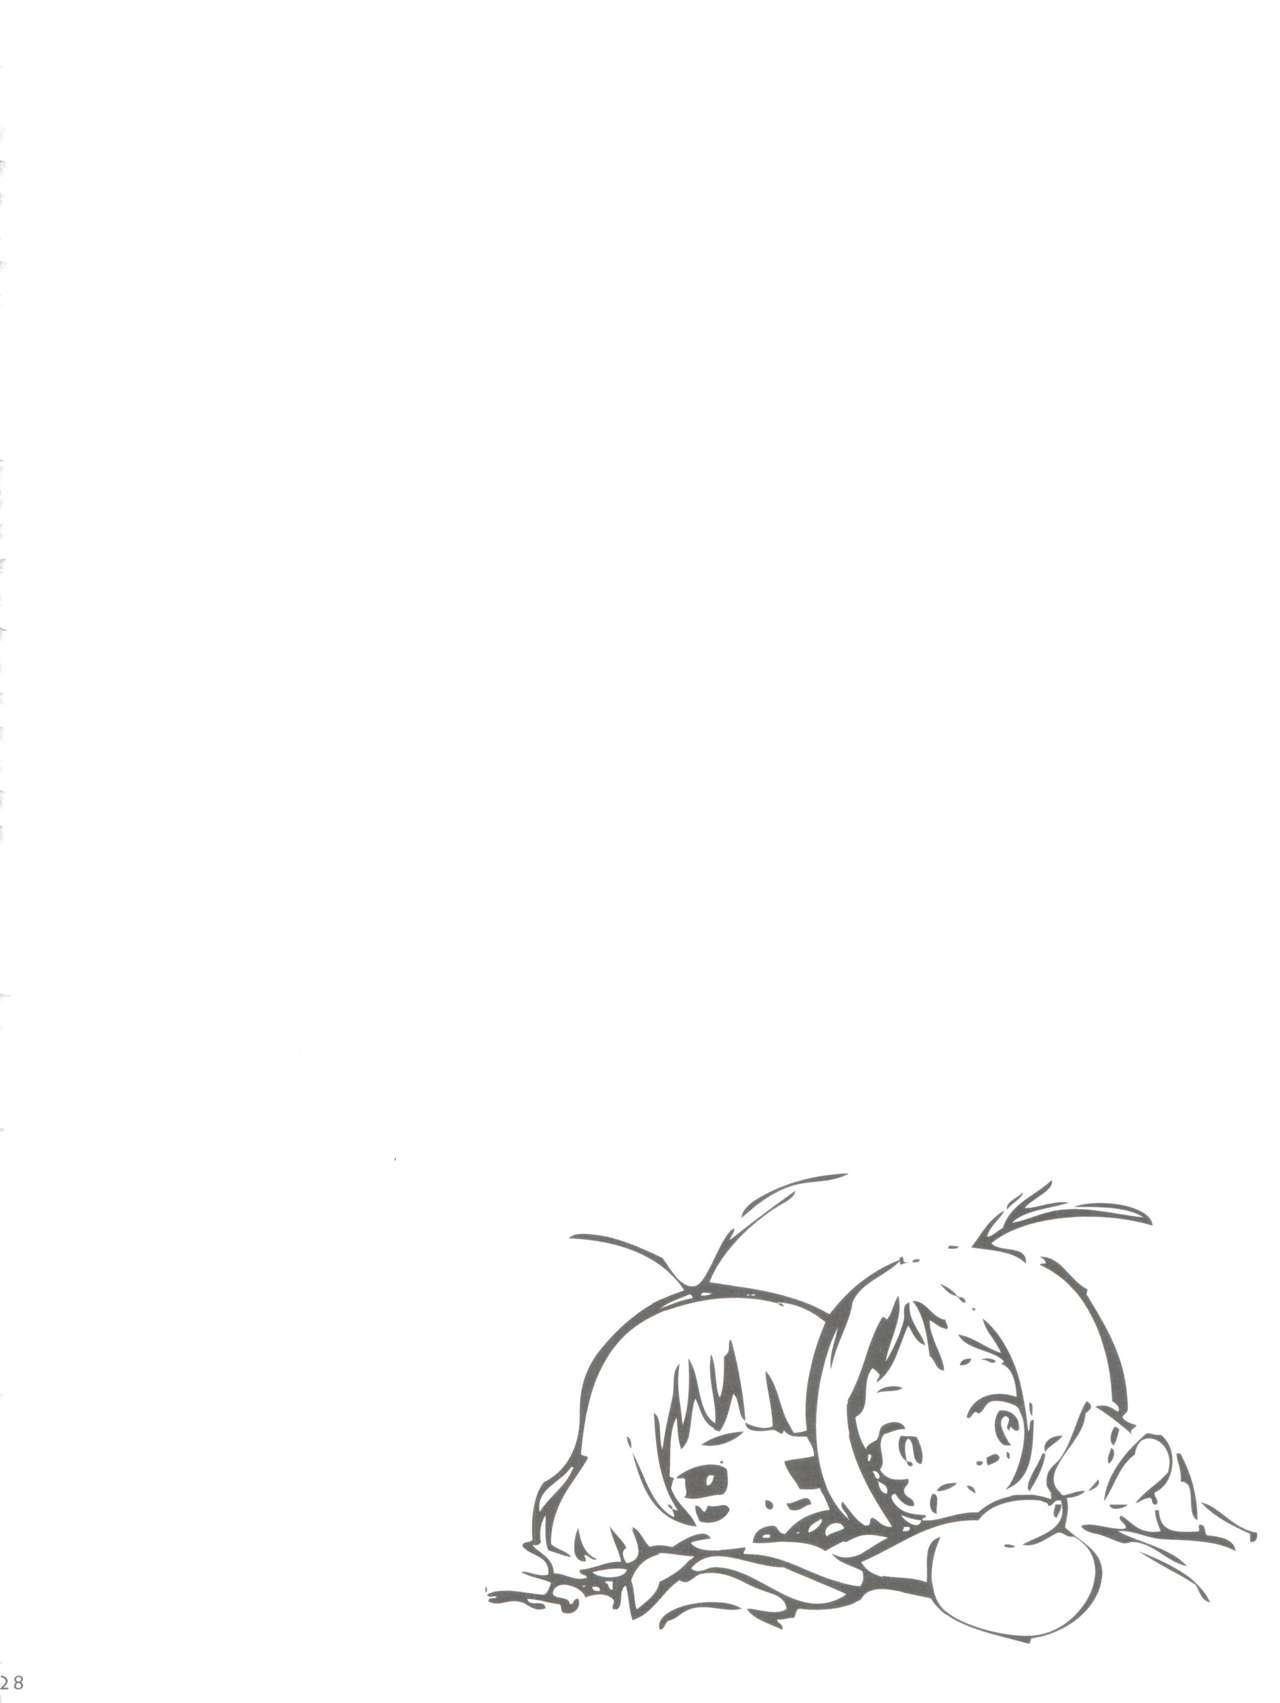 Ryo-chin Land 27